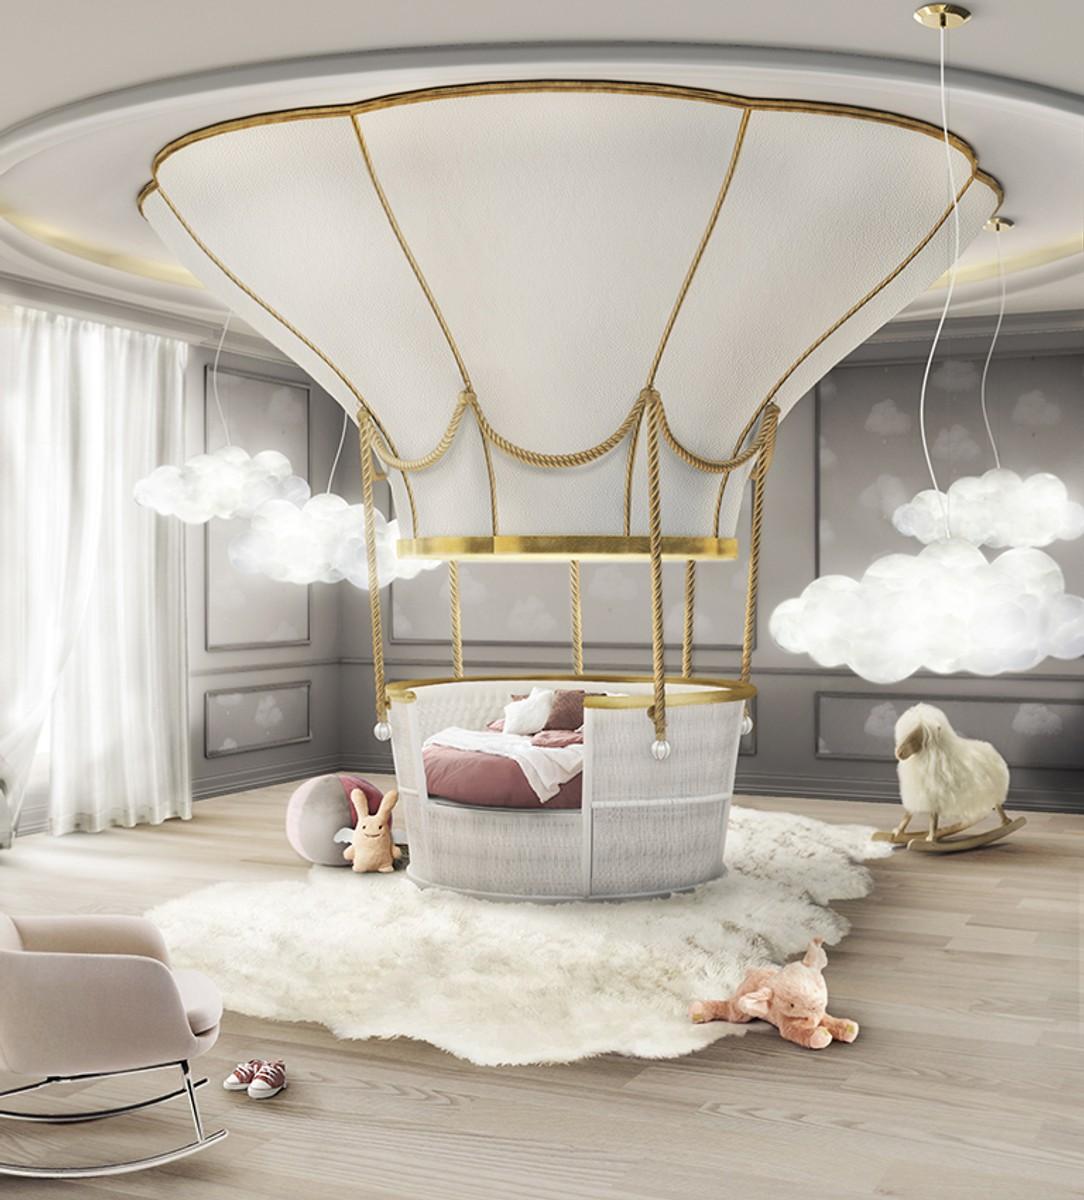 Full Size of Luxus Betten Bett Sofa Fantasy Air Ballon Circu Tagesdecken Für Boxspring Massivholz Treca Ruf Preise Massiv Billige Kopfteile Landhausstil Moebel De Holz Bett Luxus Betten